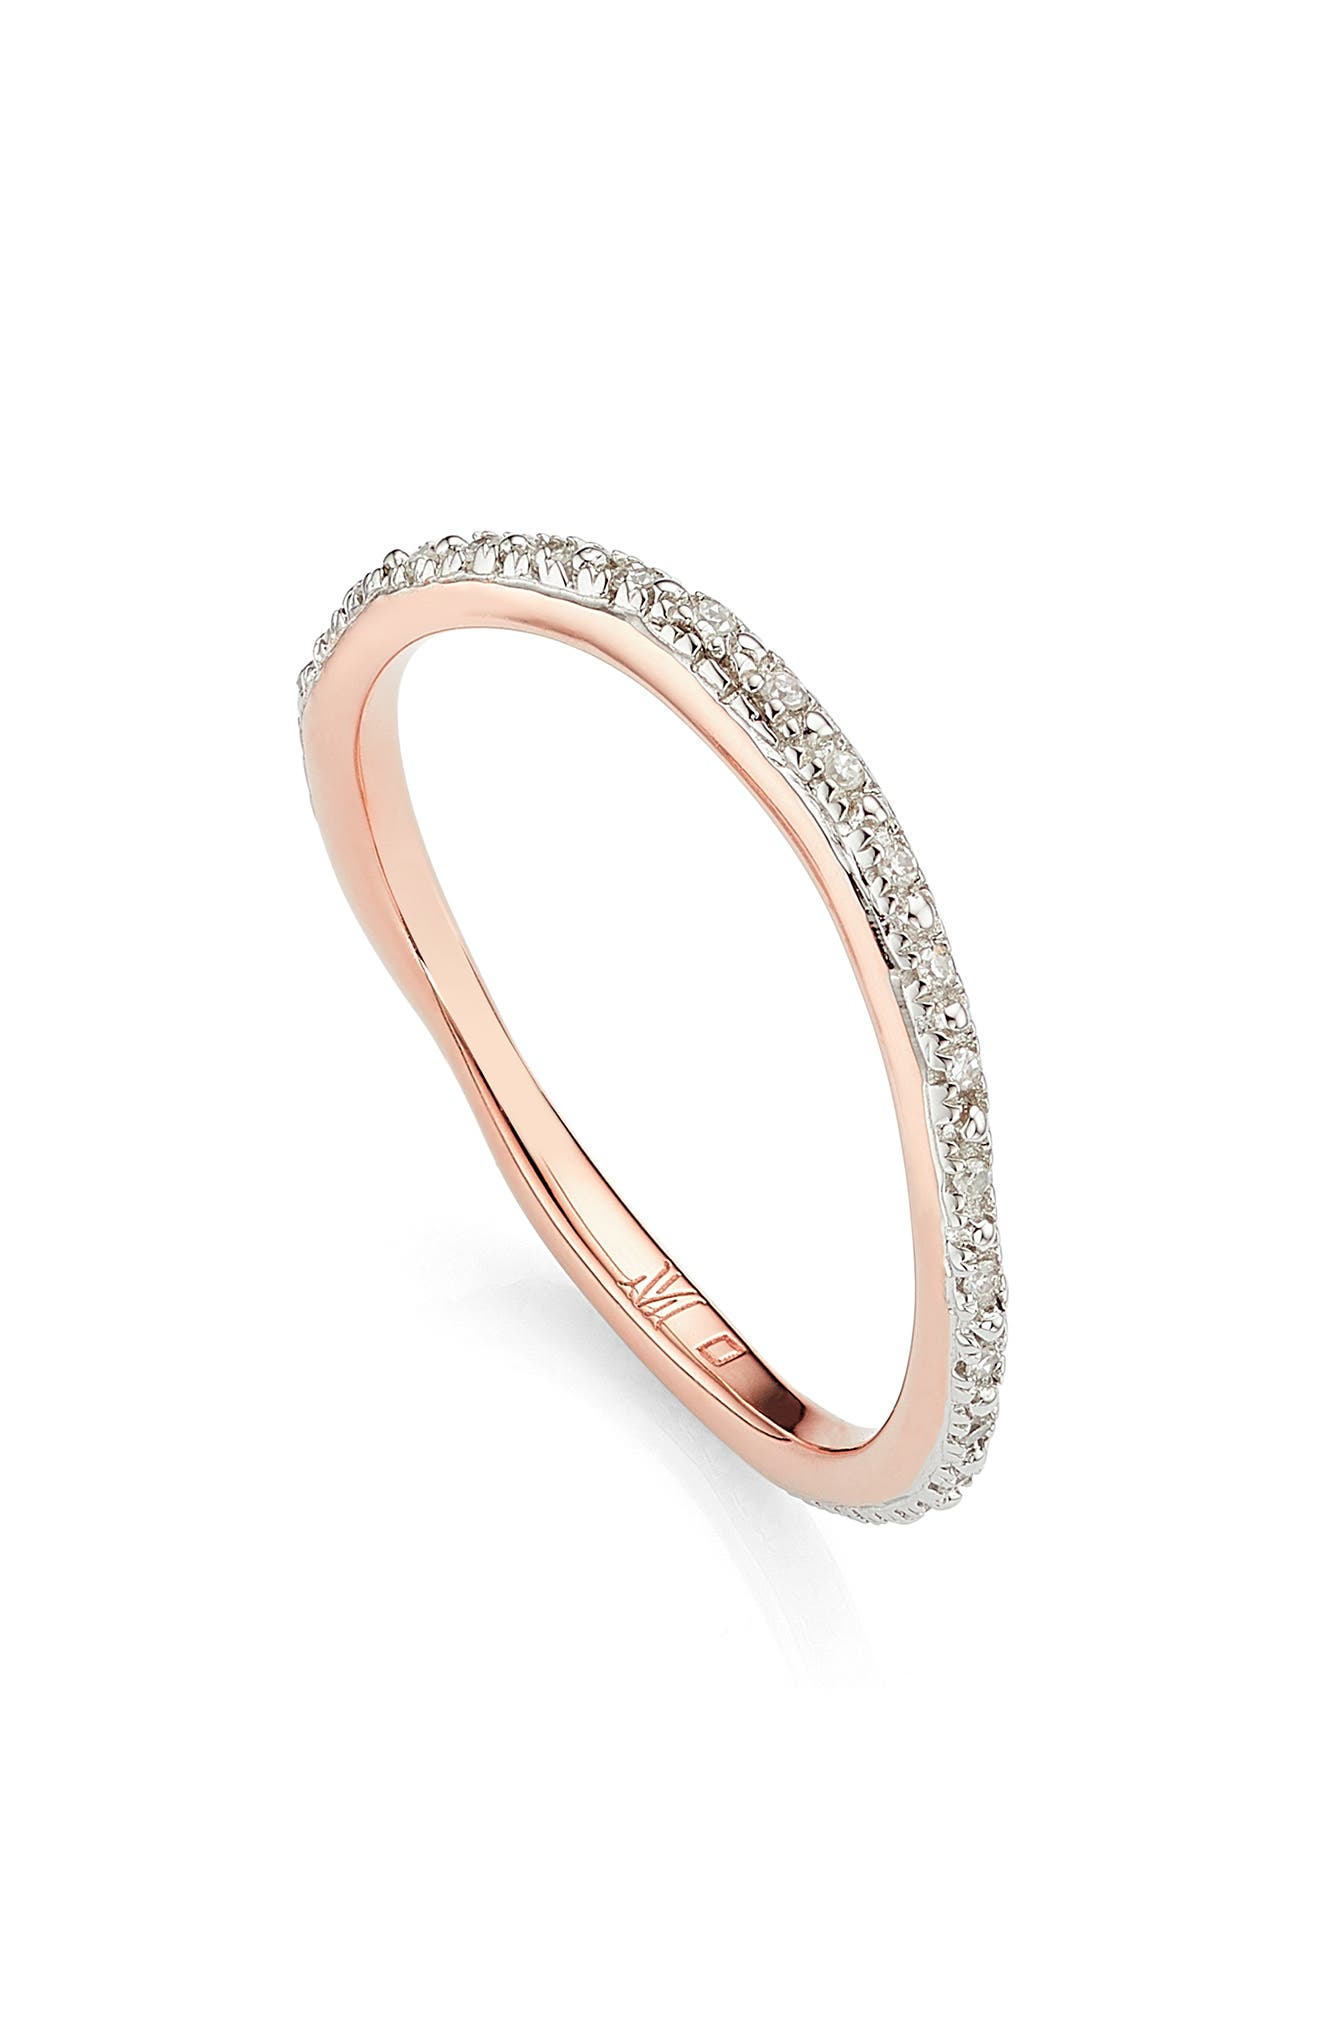 Riva Wave Diamond Eternity Ring,                         Main,                         color, ROSE GOLD/ DIAMOND